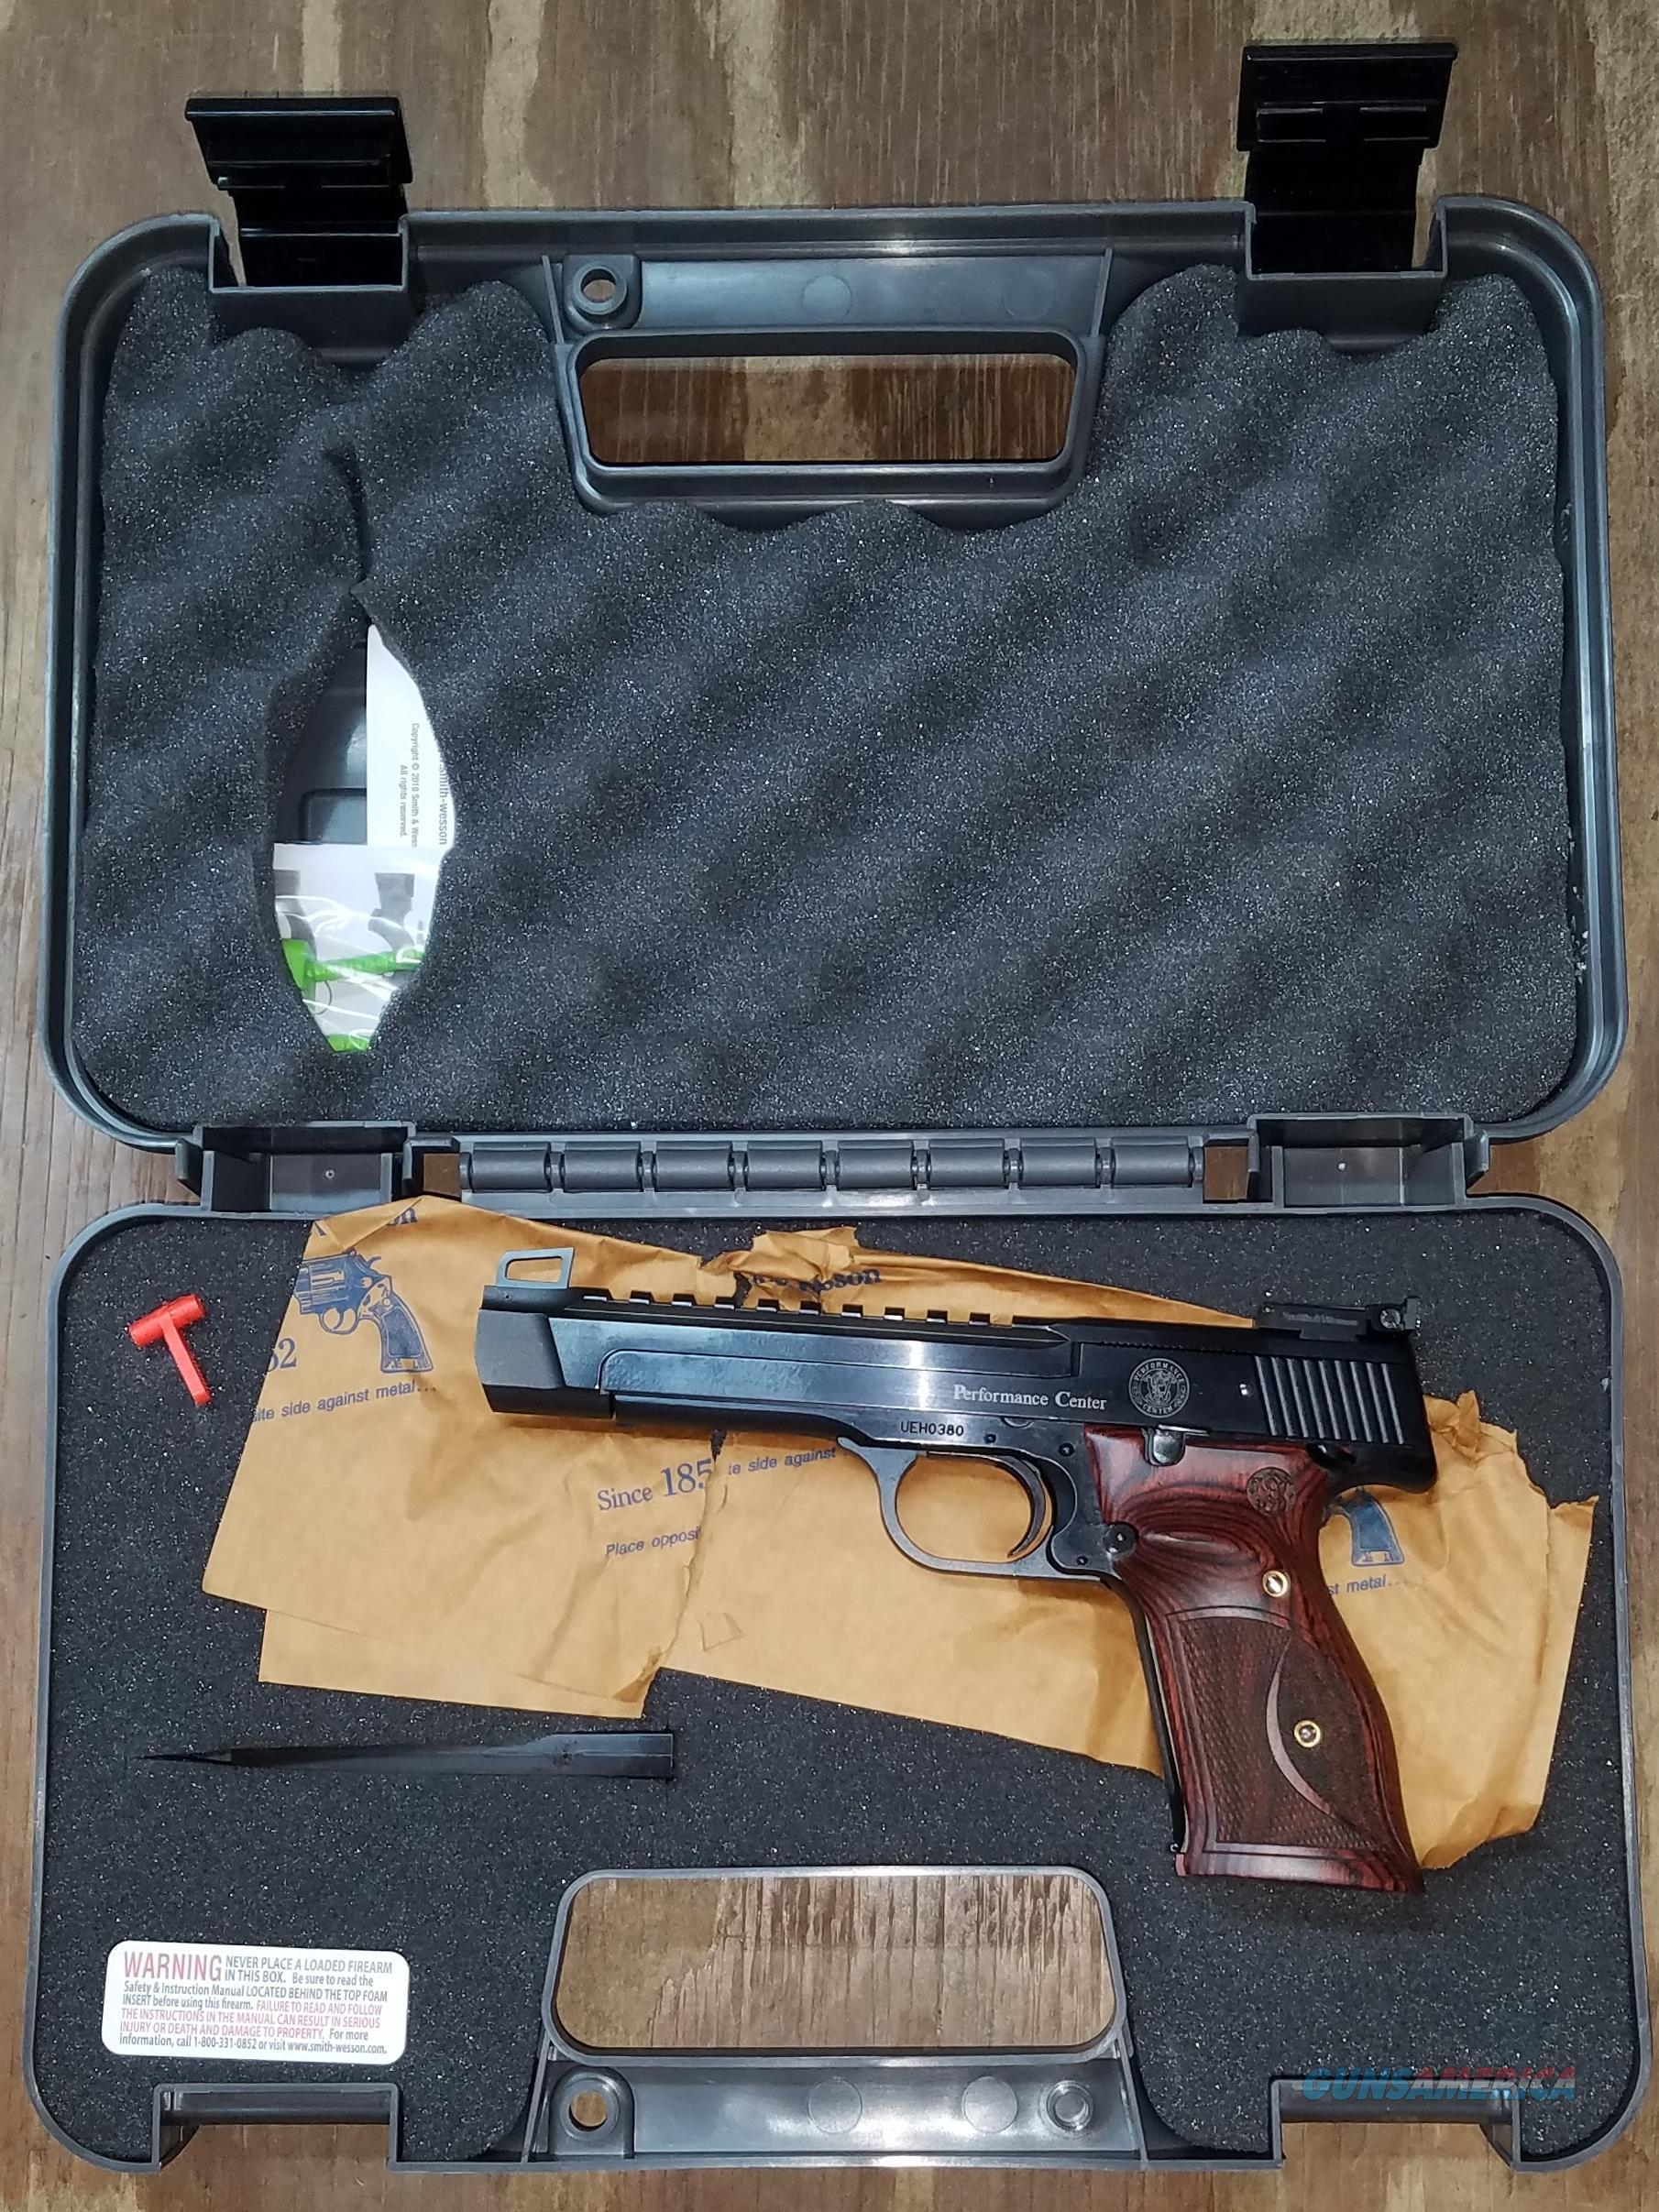 Smith & Wesson Performance center M41 22 LR 178031  Guns > Pistols > Smith & Wesson Pistols - Autos > .22 Autos